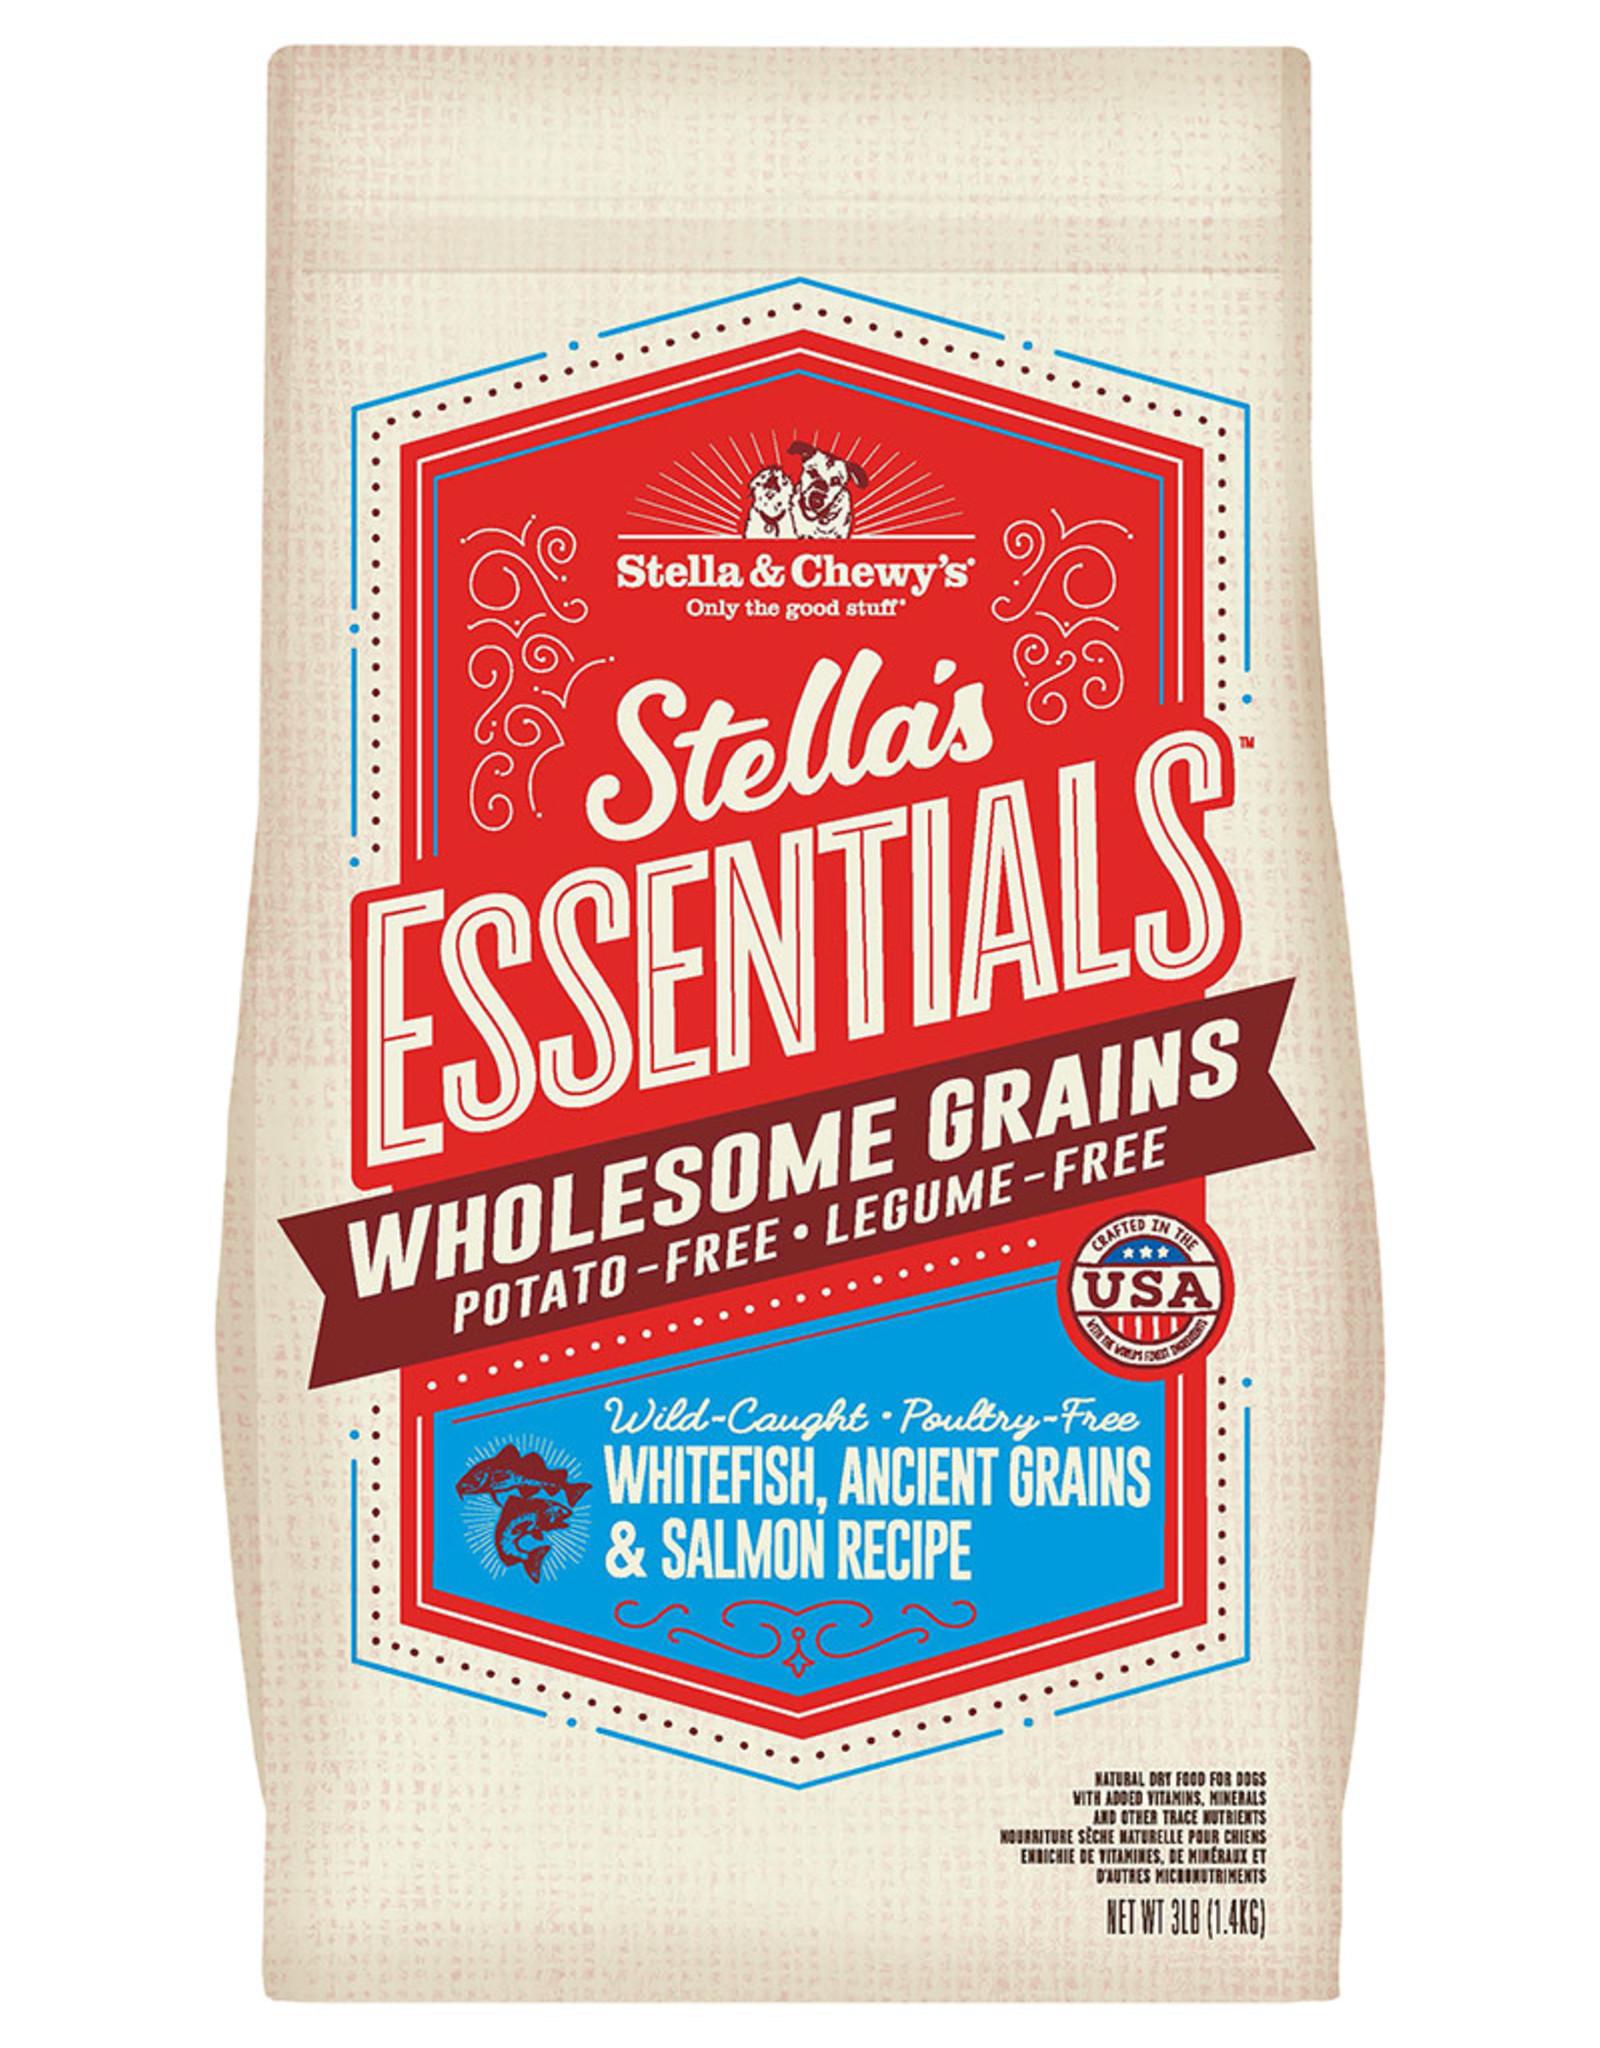 Stella & chewy's SC Essentials Whitefish, Salmon & Grains 3LB